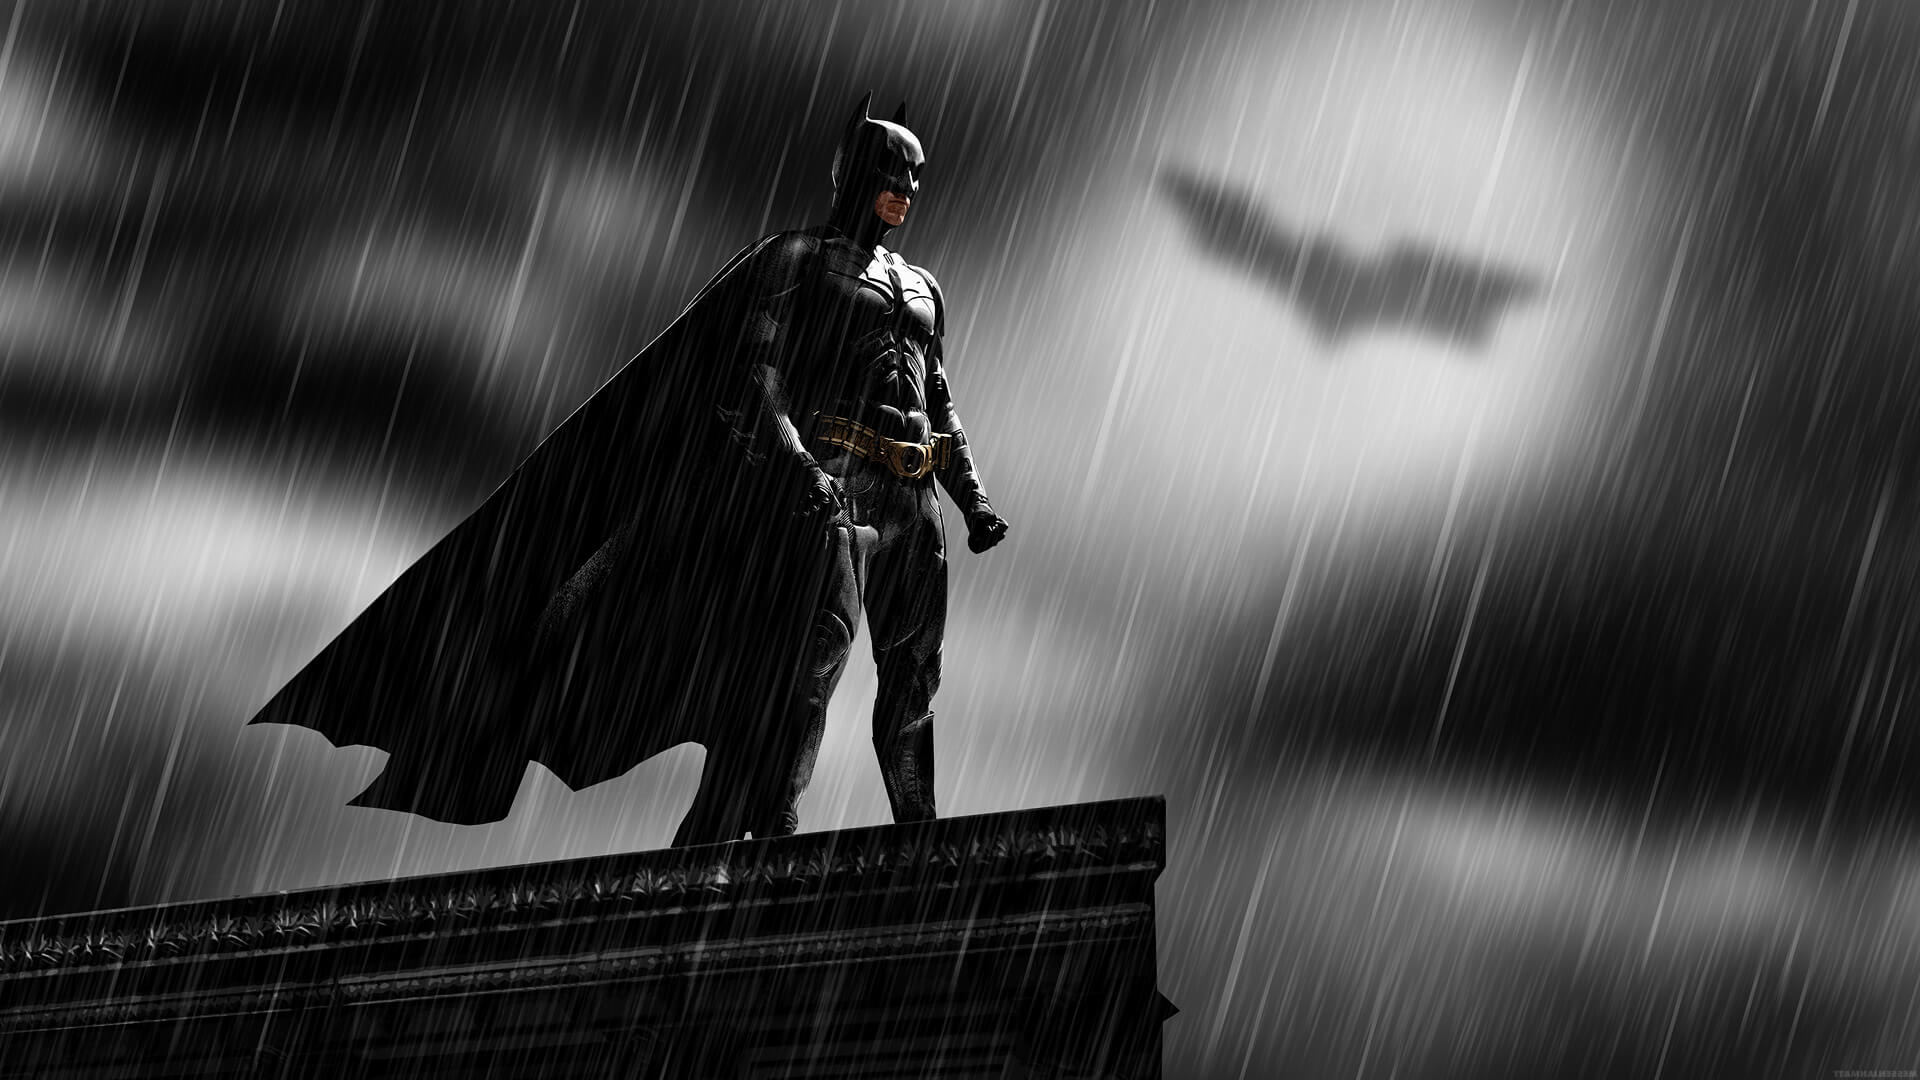 Wallpaperswide Batman Wallpaper Hd Download Free